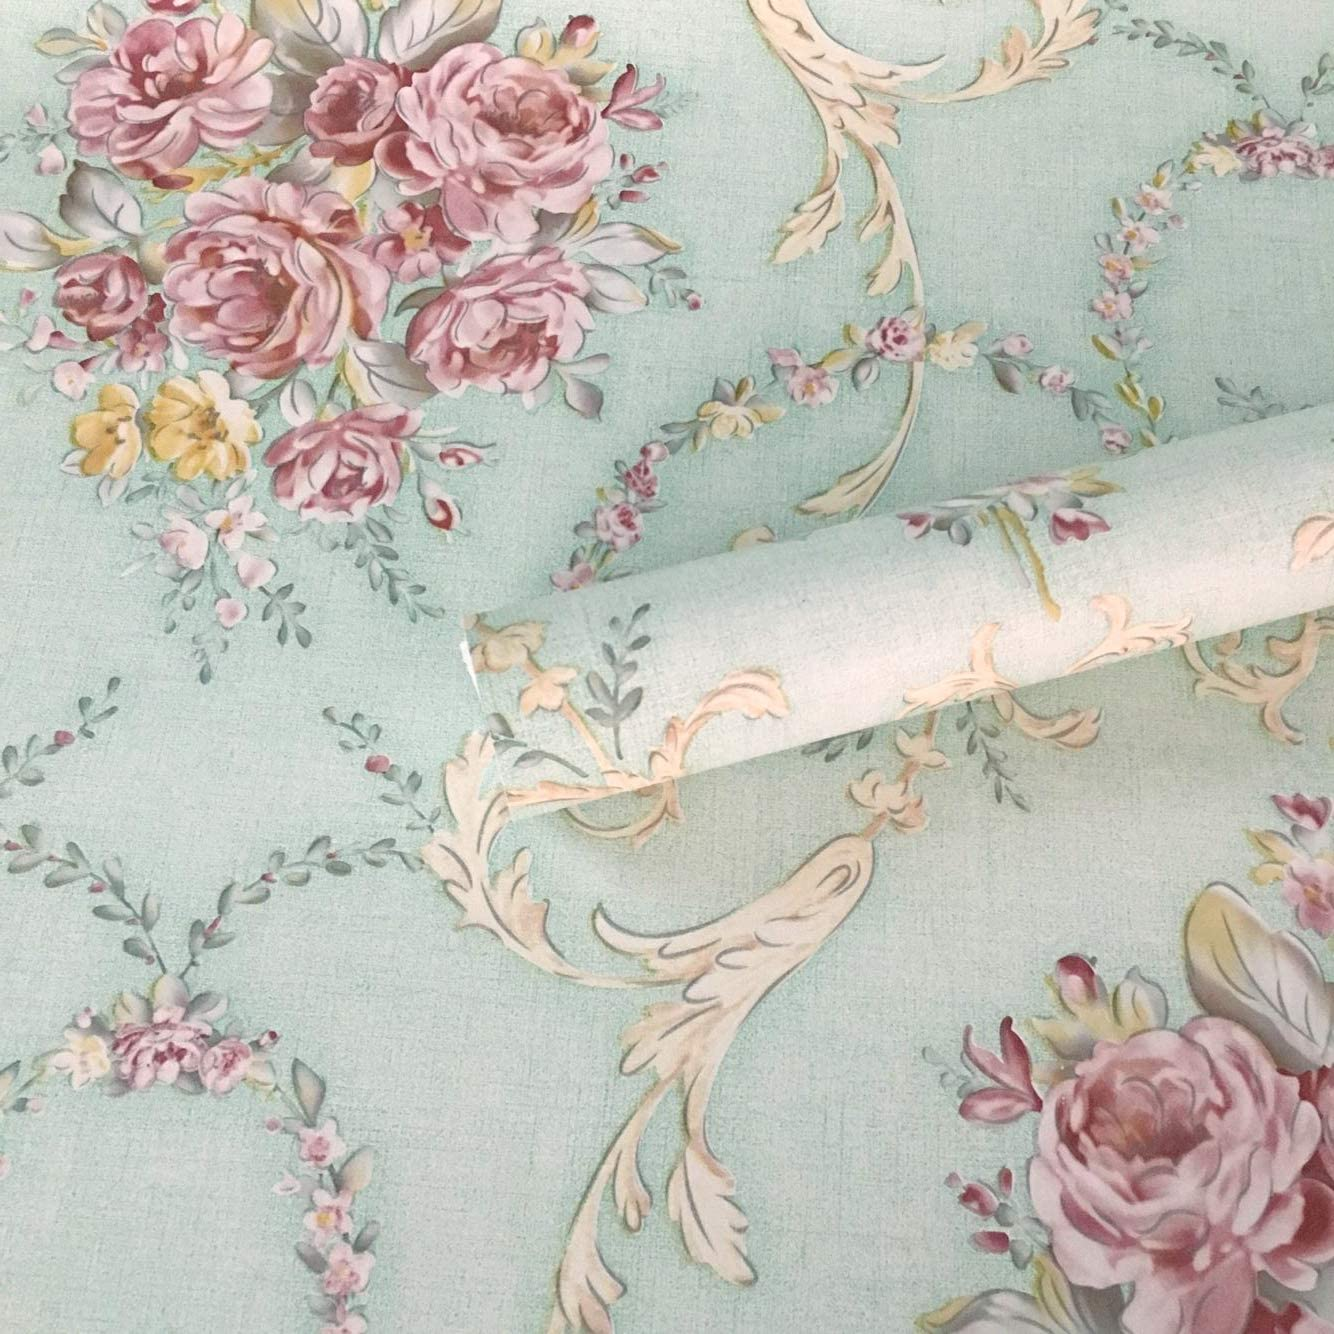 Amazon Com Tooldeco Vintage Floral Paper Peel And Stick Wallpaper